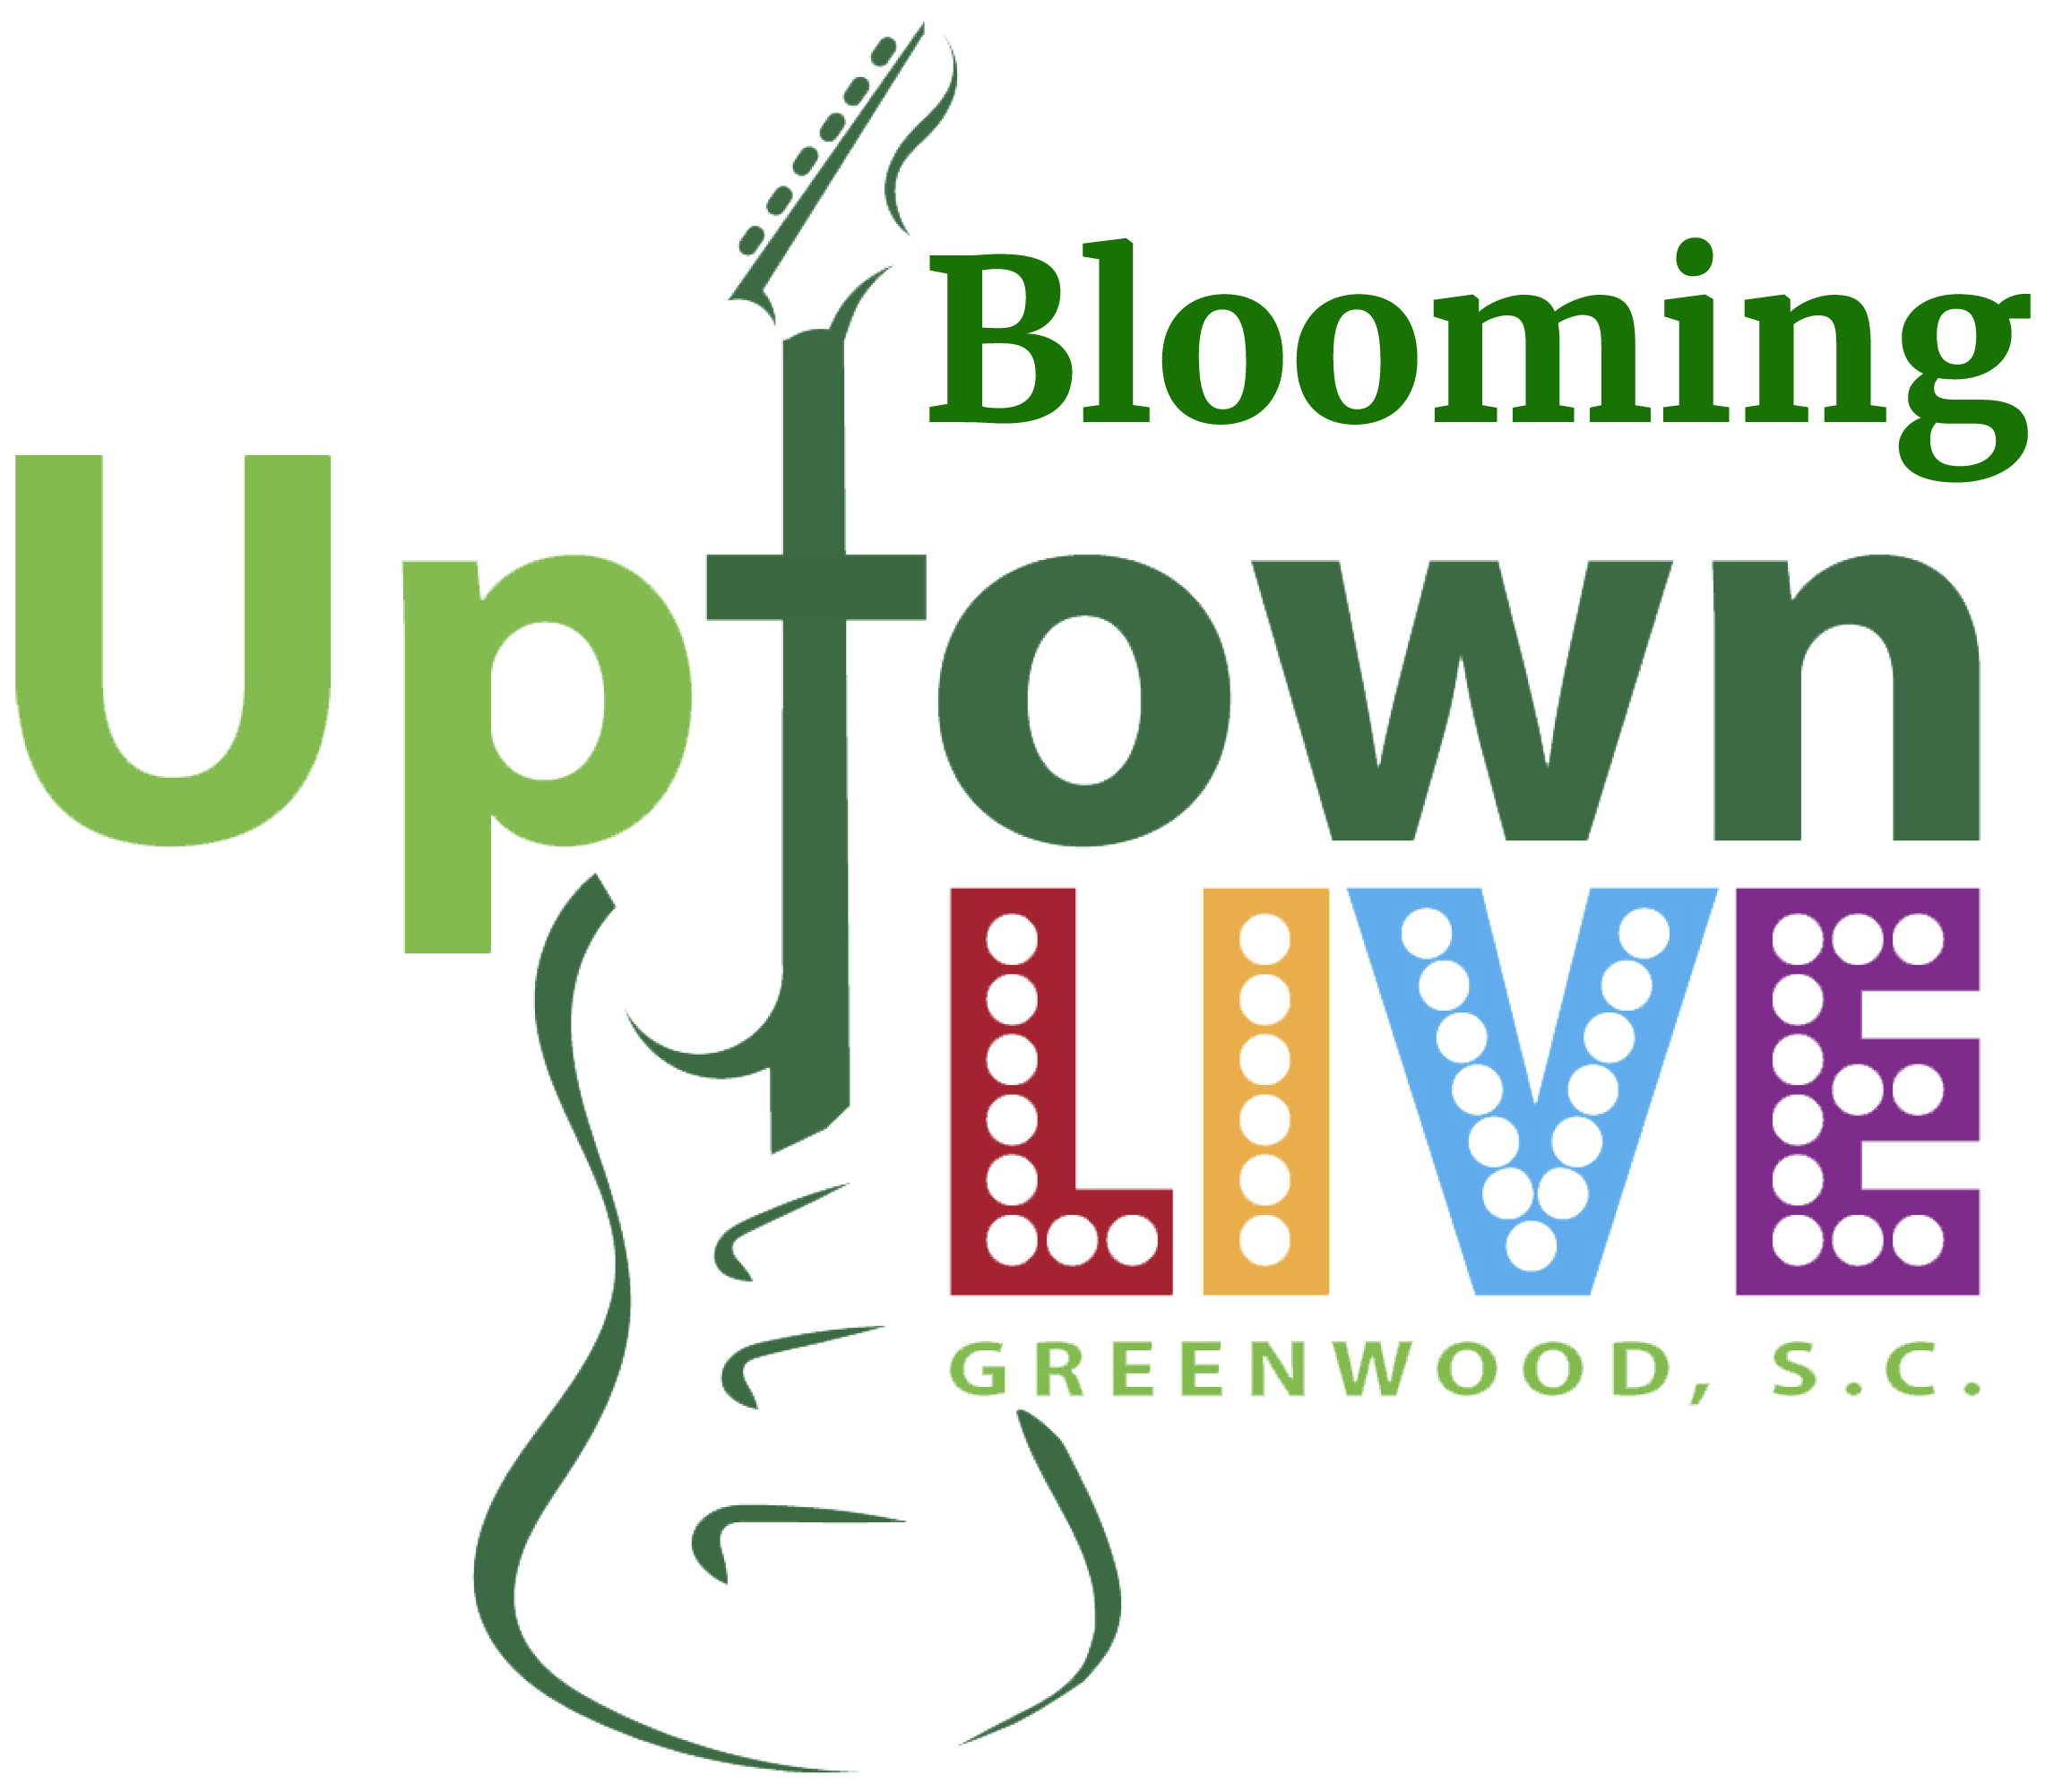 BloomingUptownLive2.png